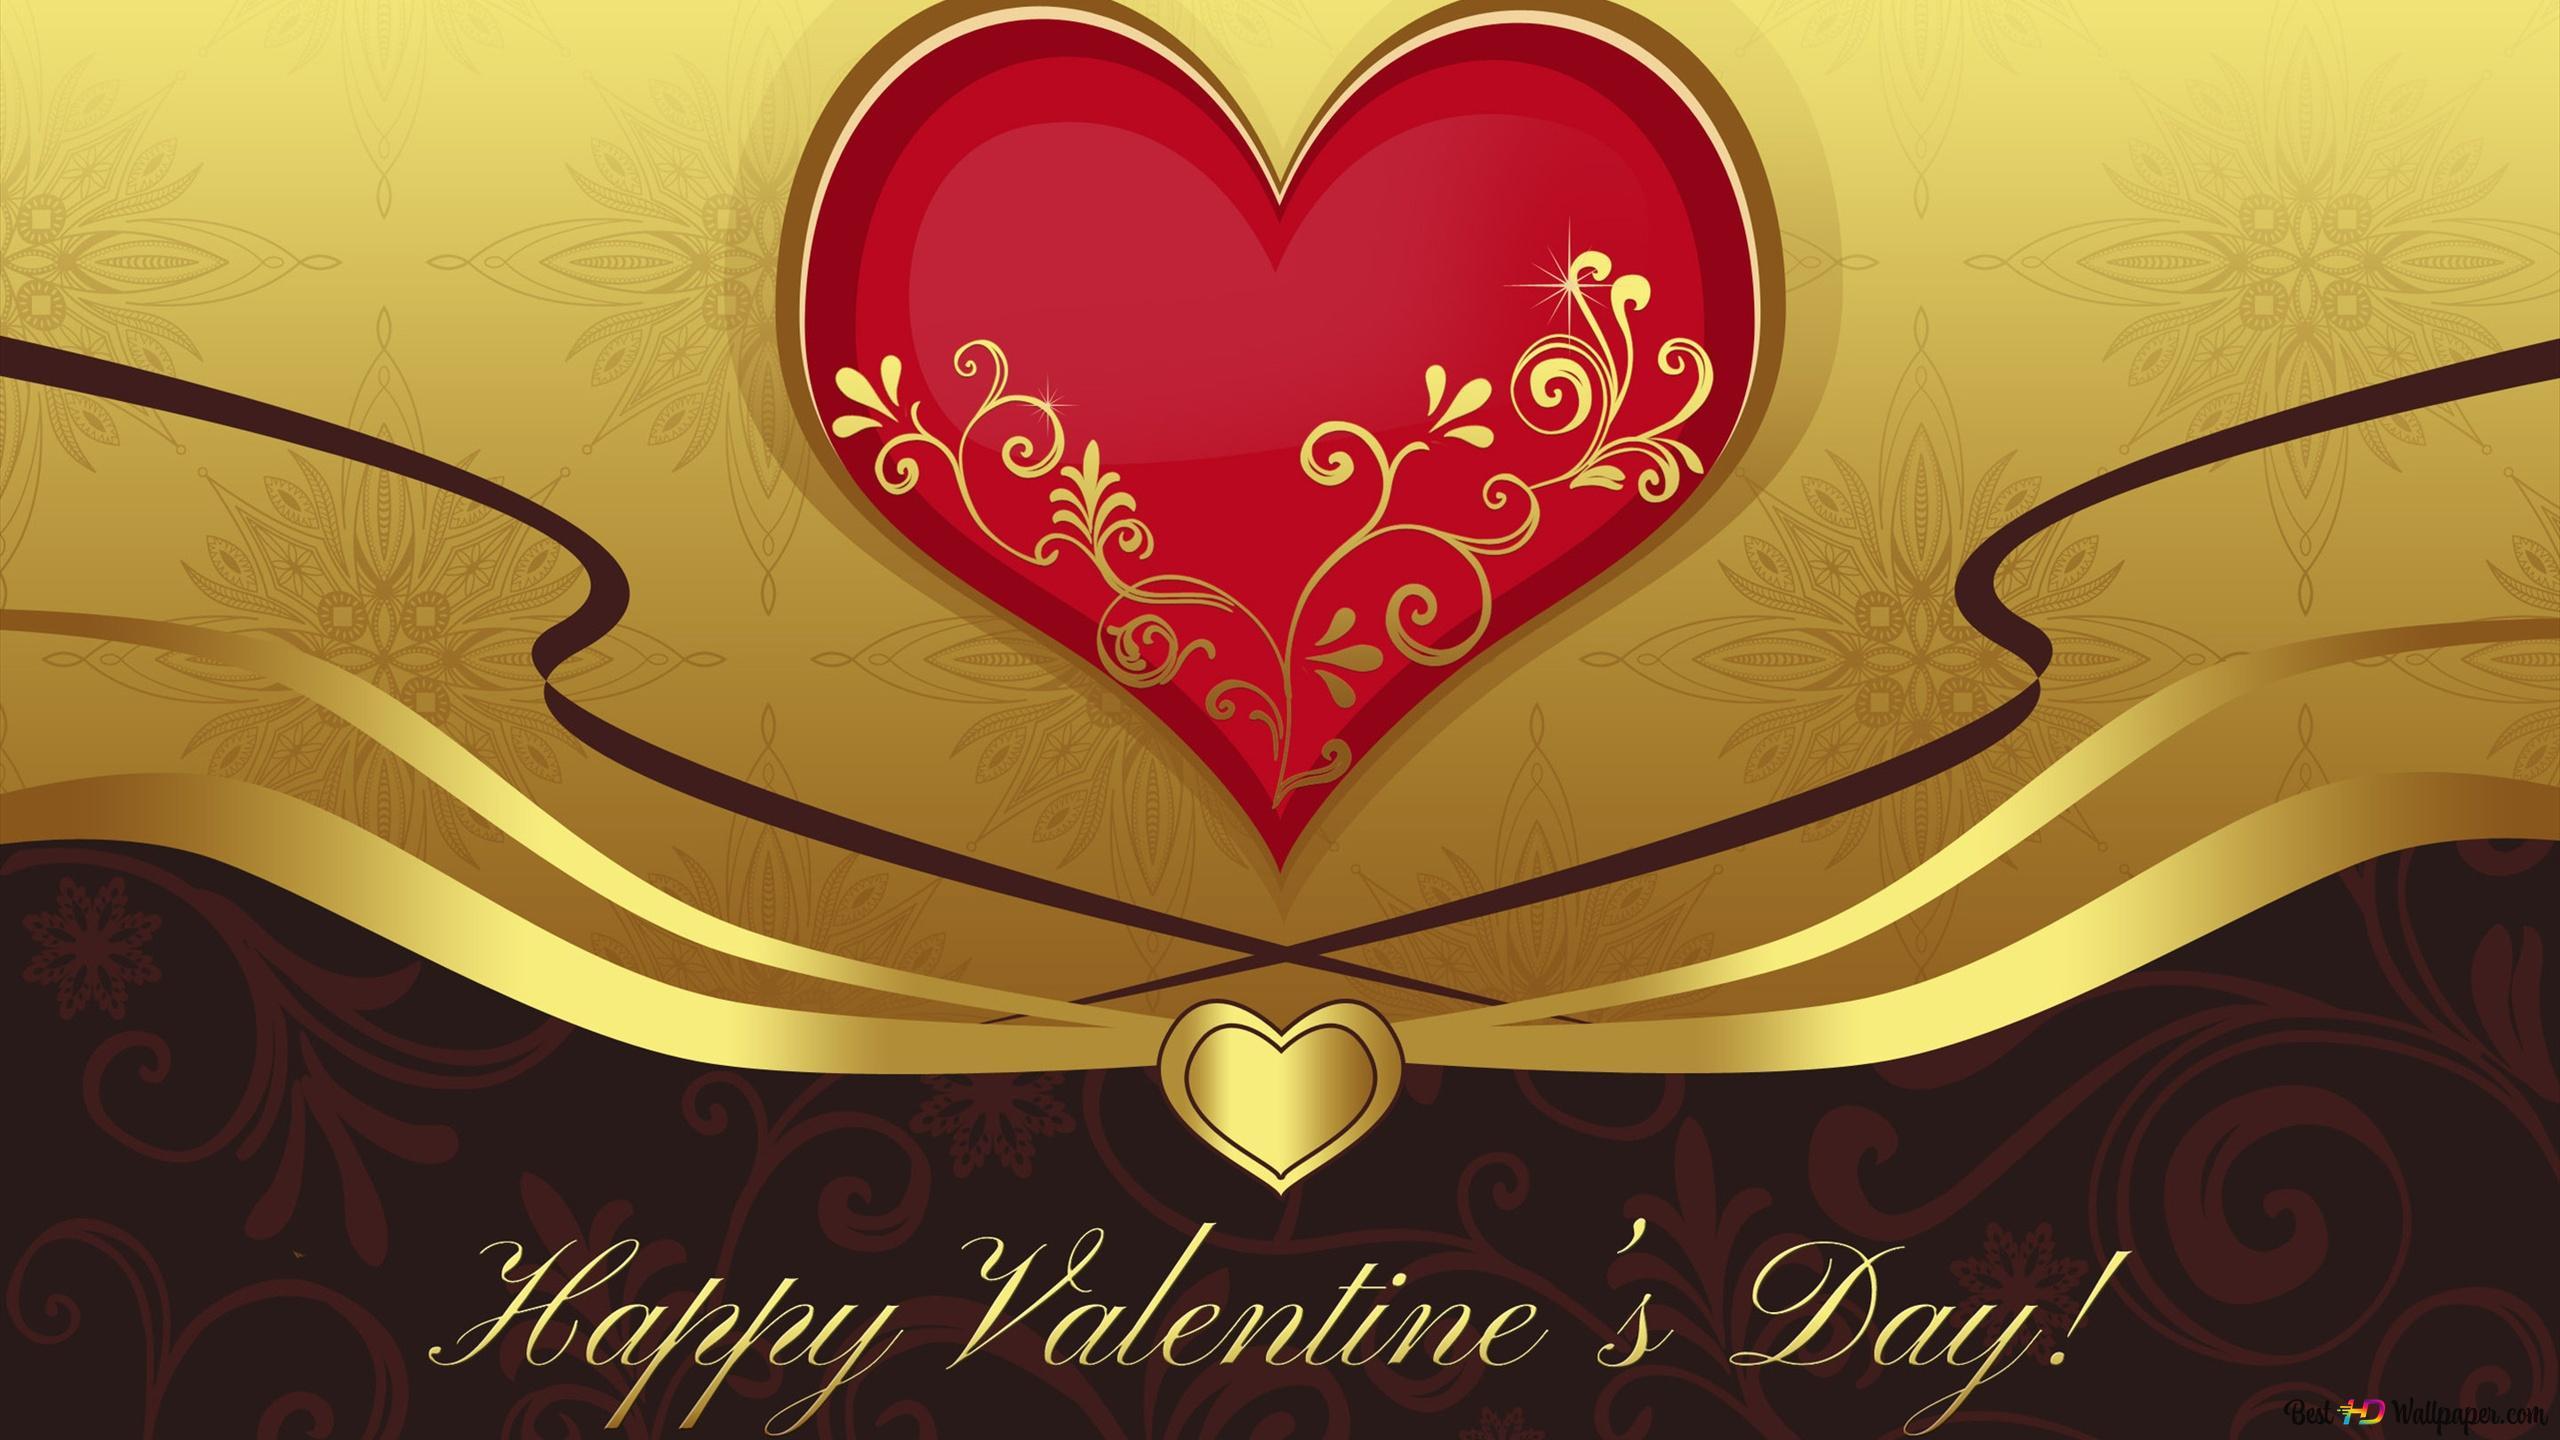 valentines day background.html